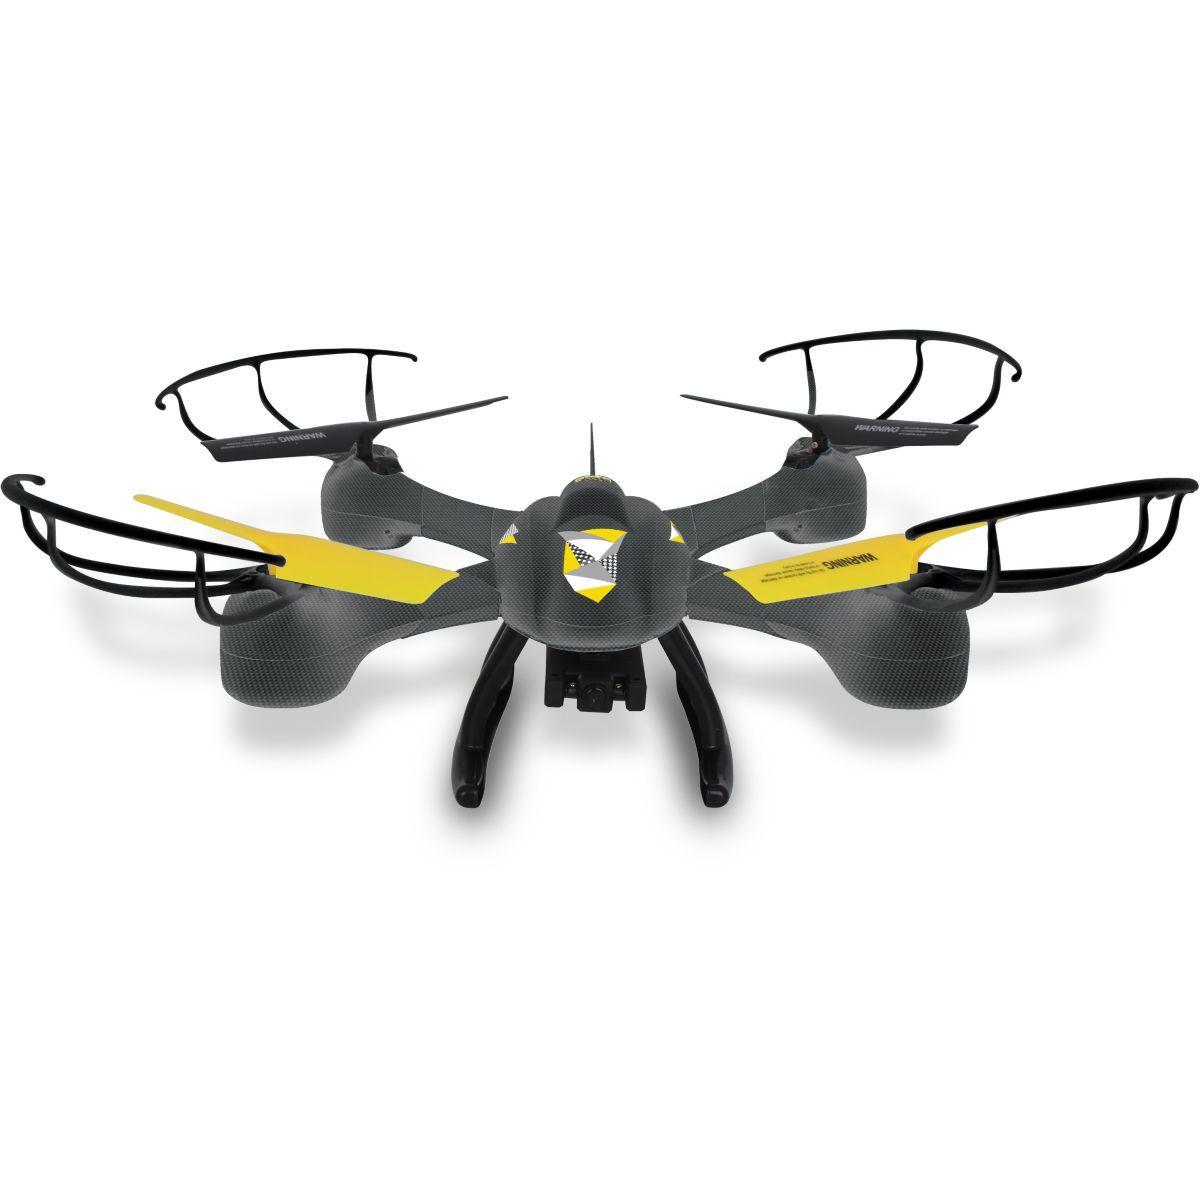 Drone mondo motors ultradrone r/c x40.0 vr mask + c wi fi - 7% de remise immédiate avec le code : fete7 (photo)